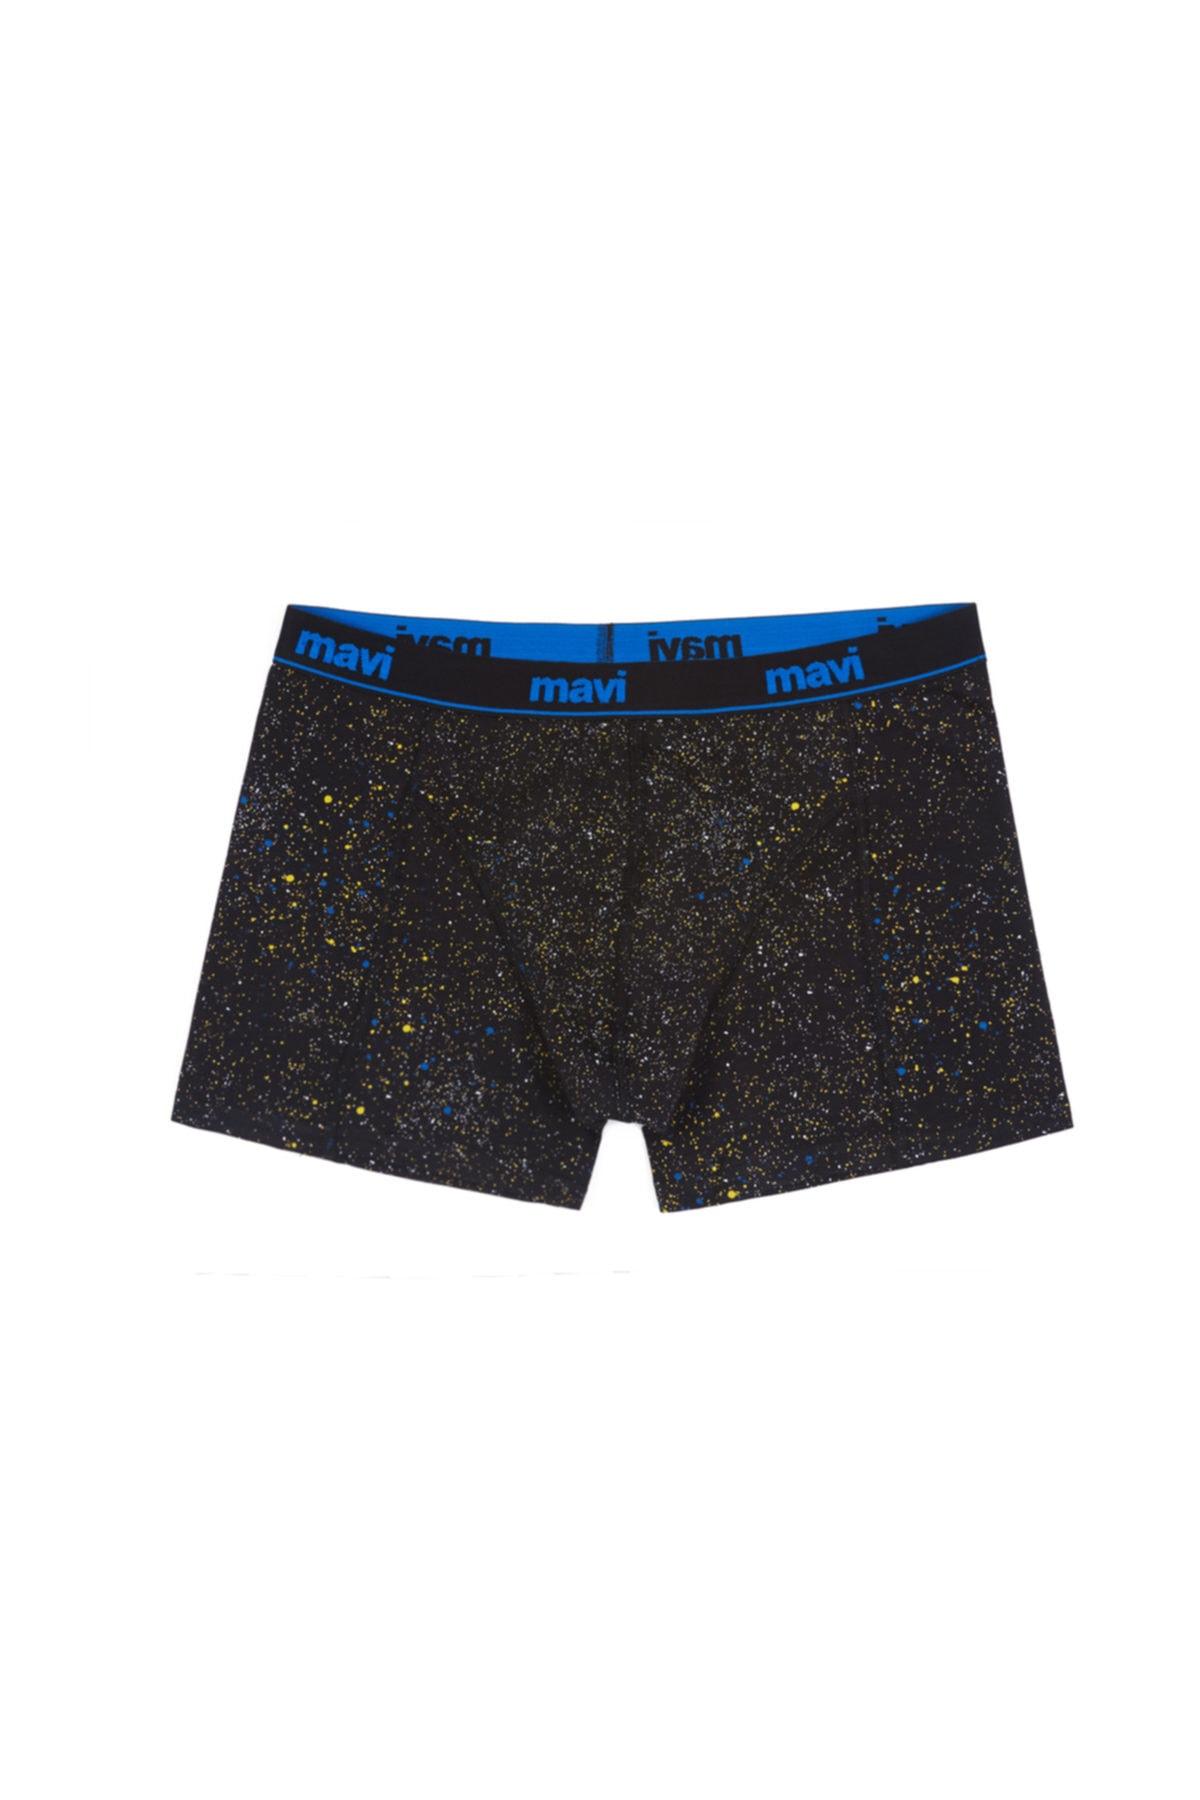 Mavi Erkek Boxer 091280-900 1